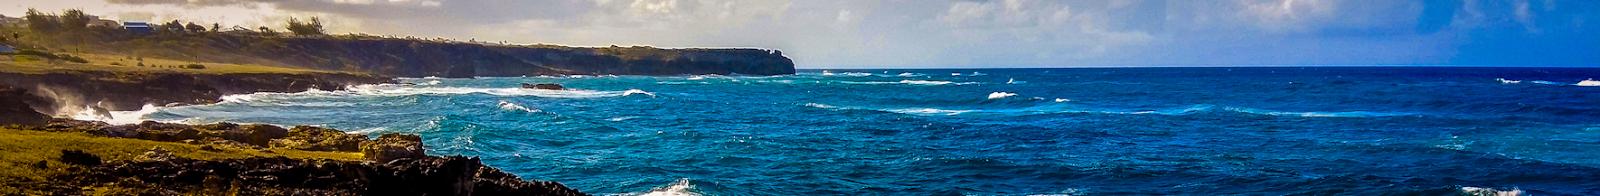 Bim Rock by Jsf-1  in Barbados